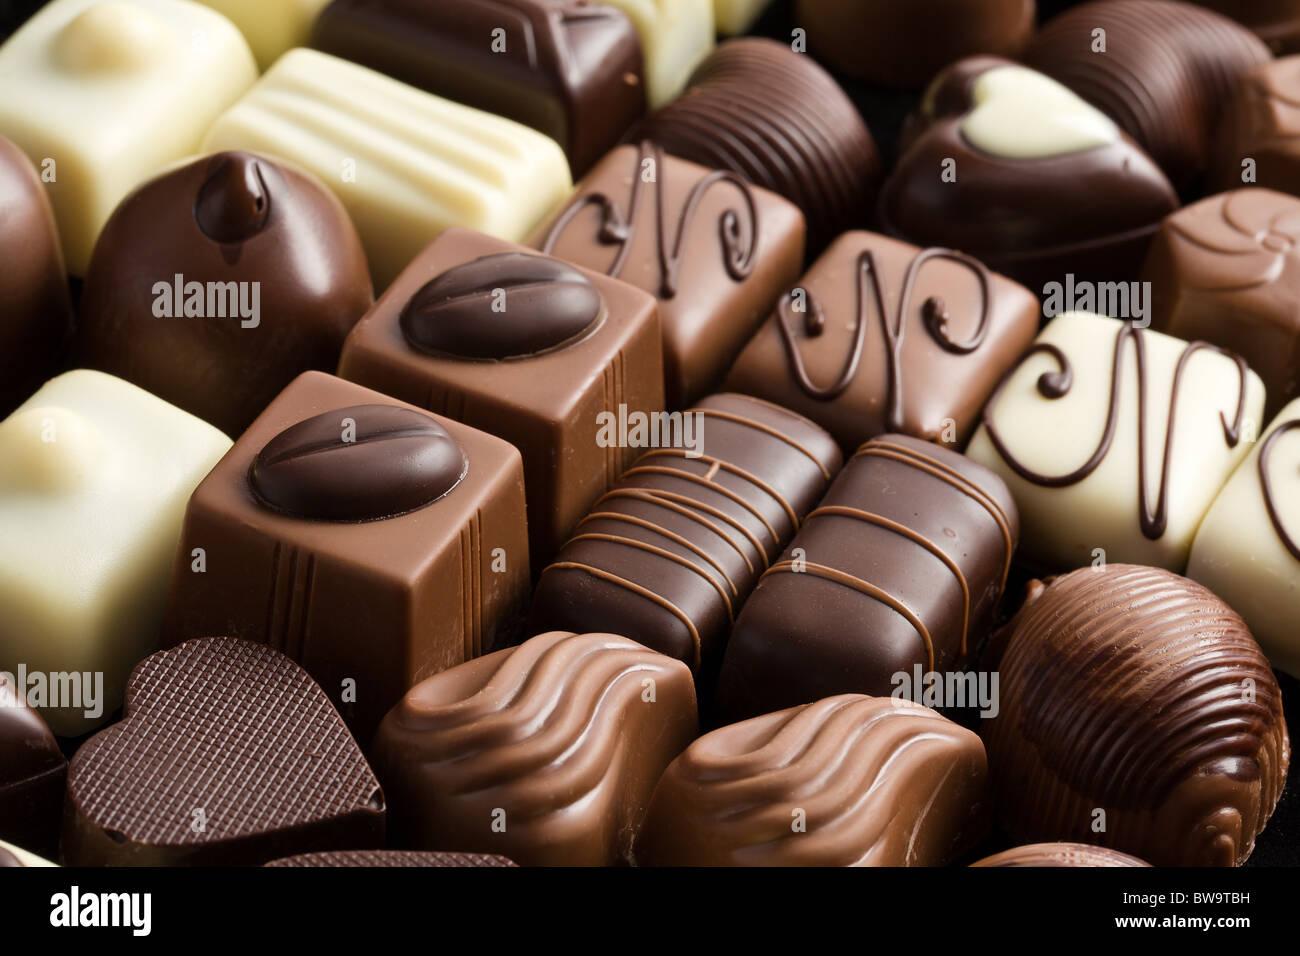 Varie praline di cioccolato Immagini Stock